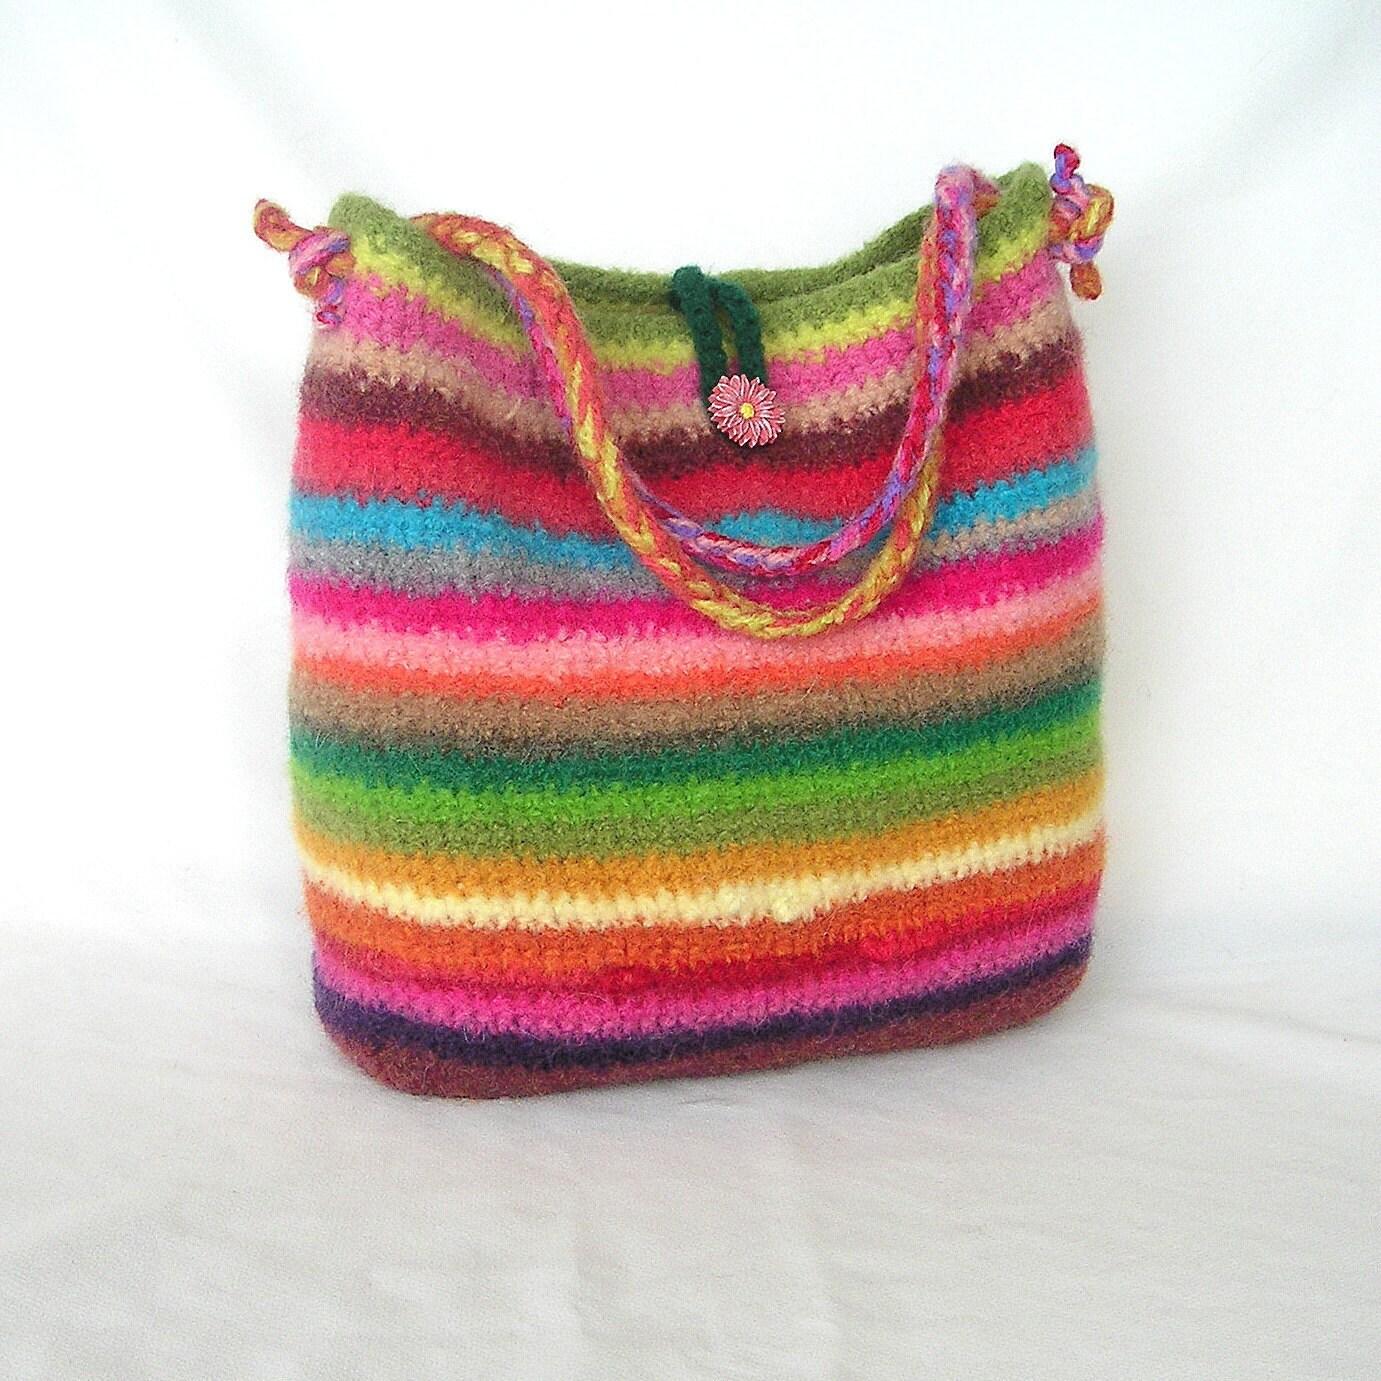 Crochet Pattern For Felted Bag | Free Patterns For Crochet